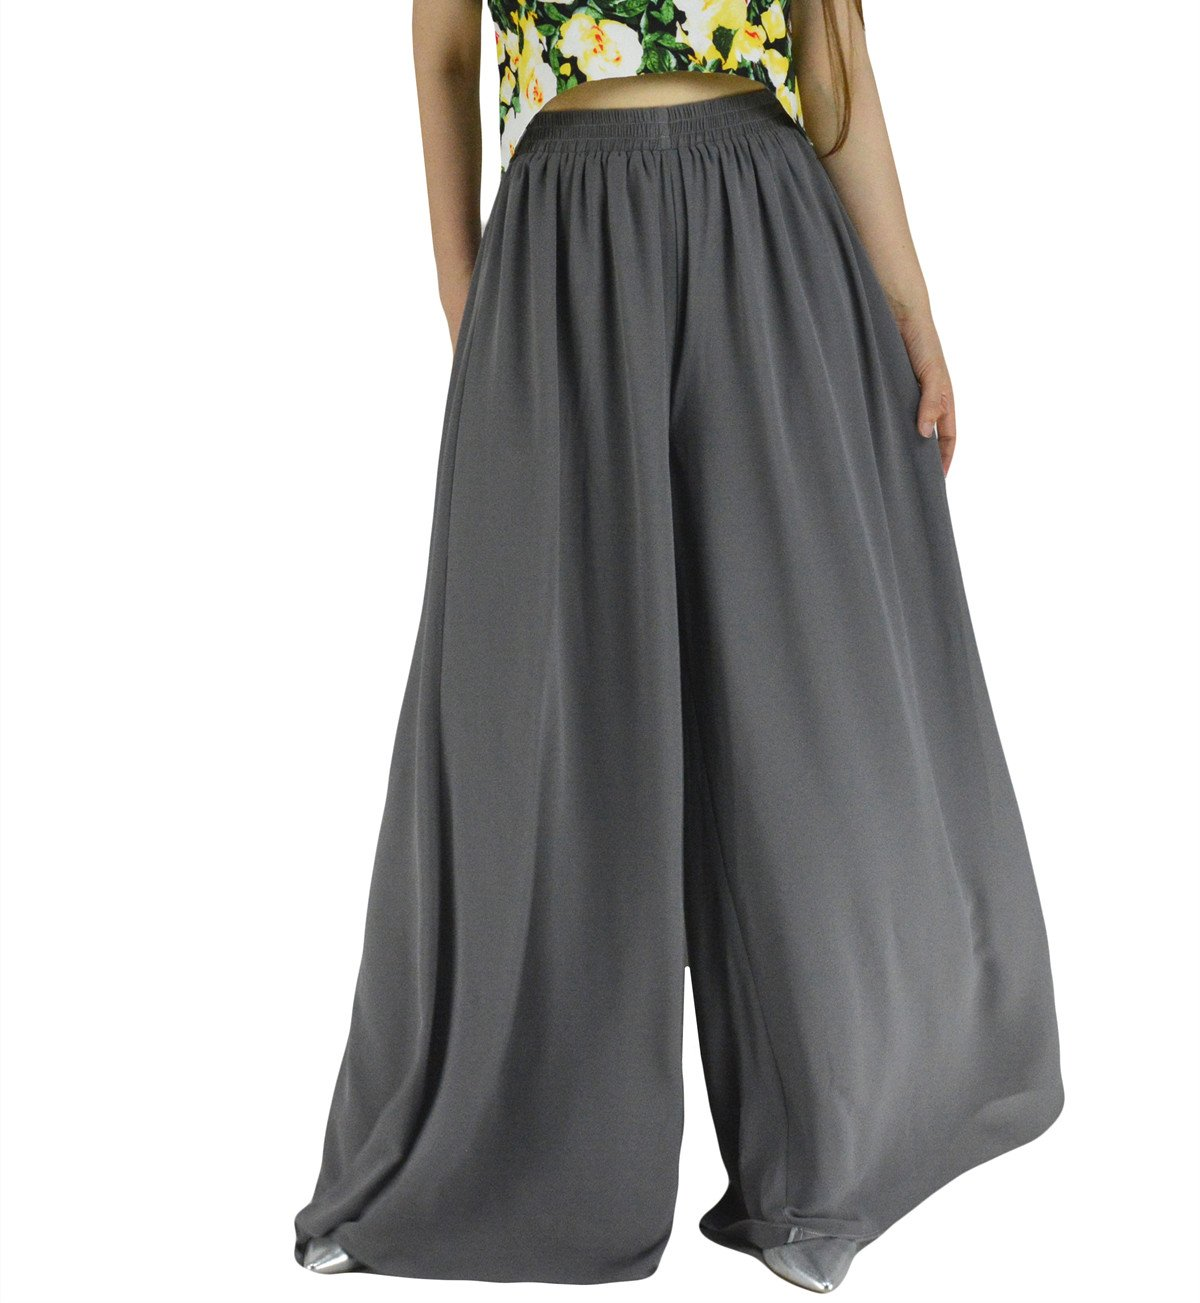 YSJ Women's Chiffon Long Palazzo Pants Solid Culottes Trousers 1216